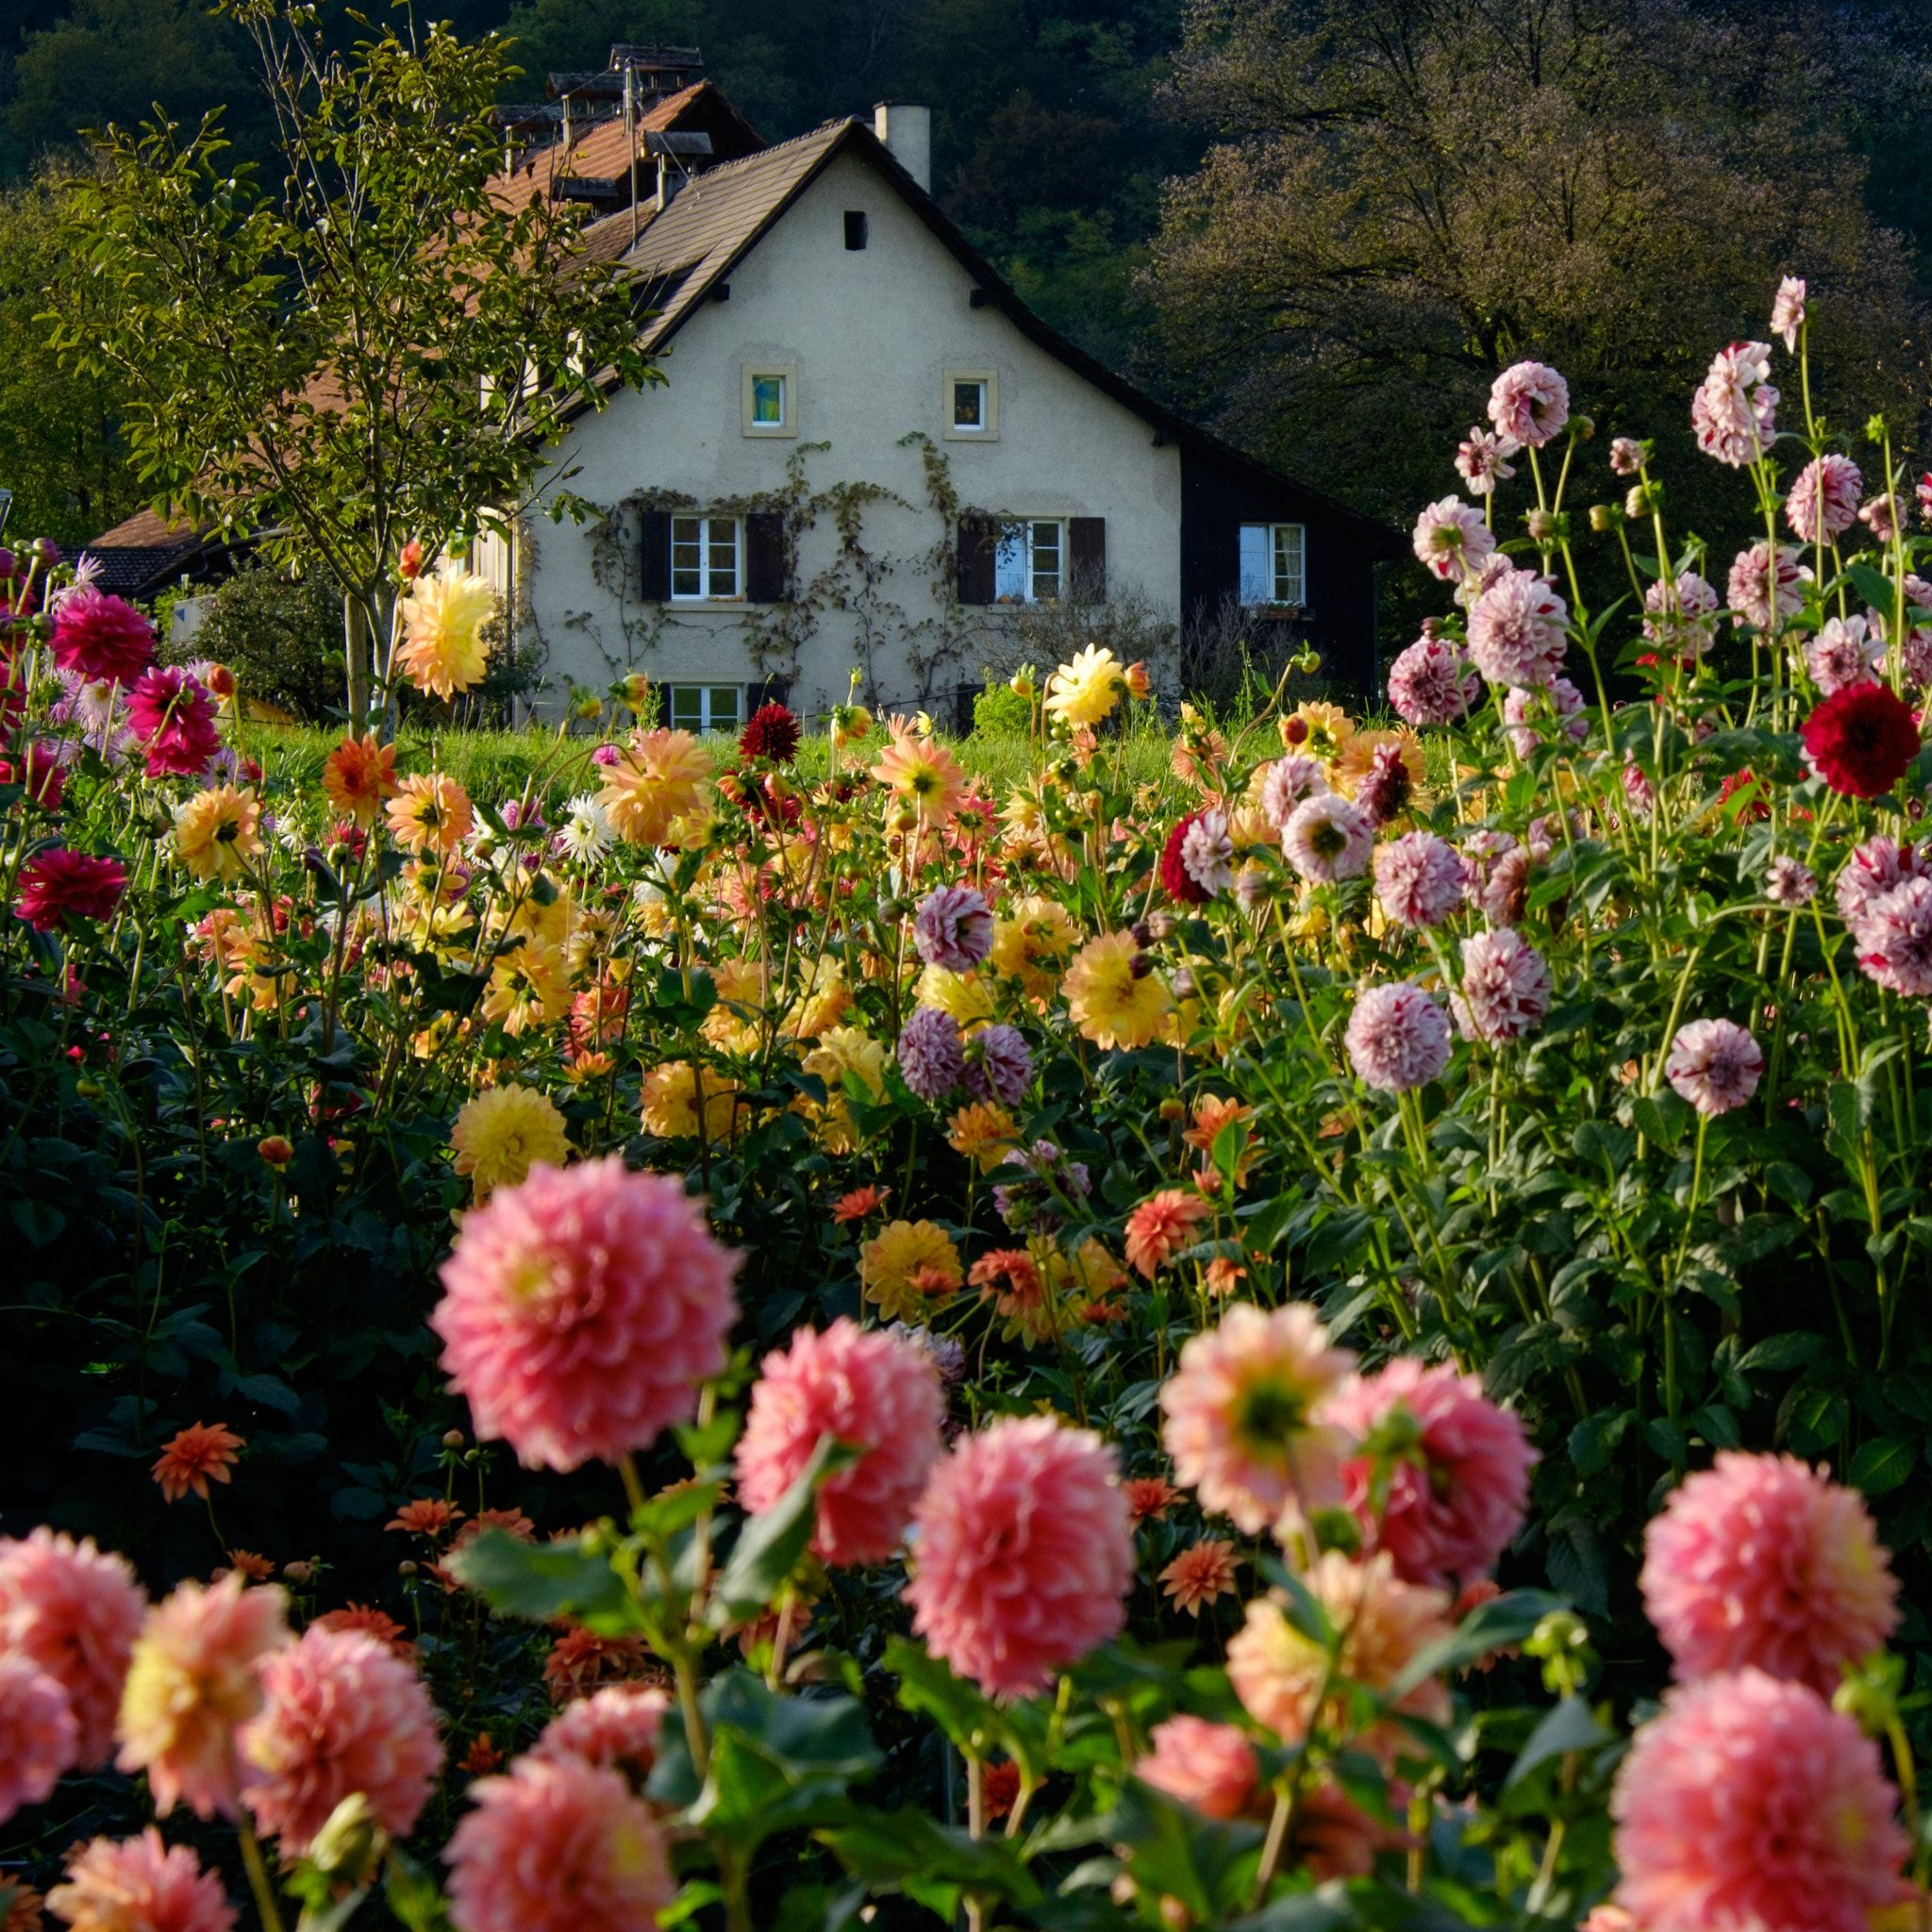 Swiss Farmhouse Garden Of Dahlias Flower Garden Of Dahlias Swiss